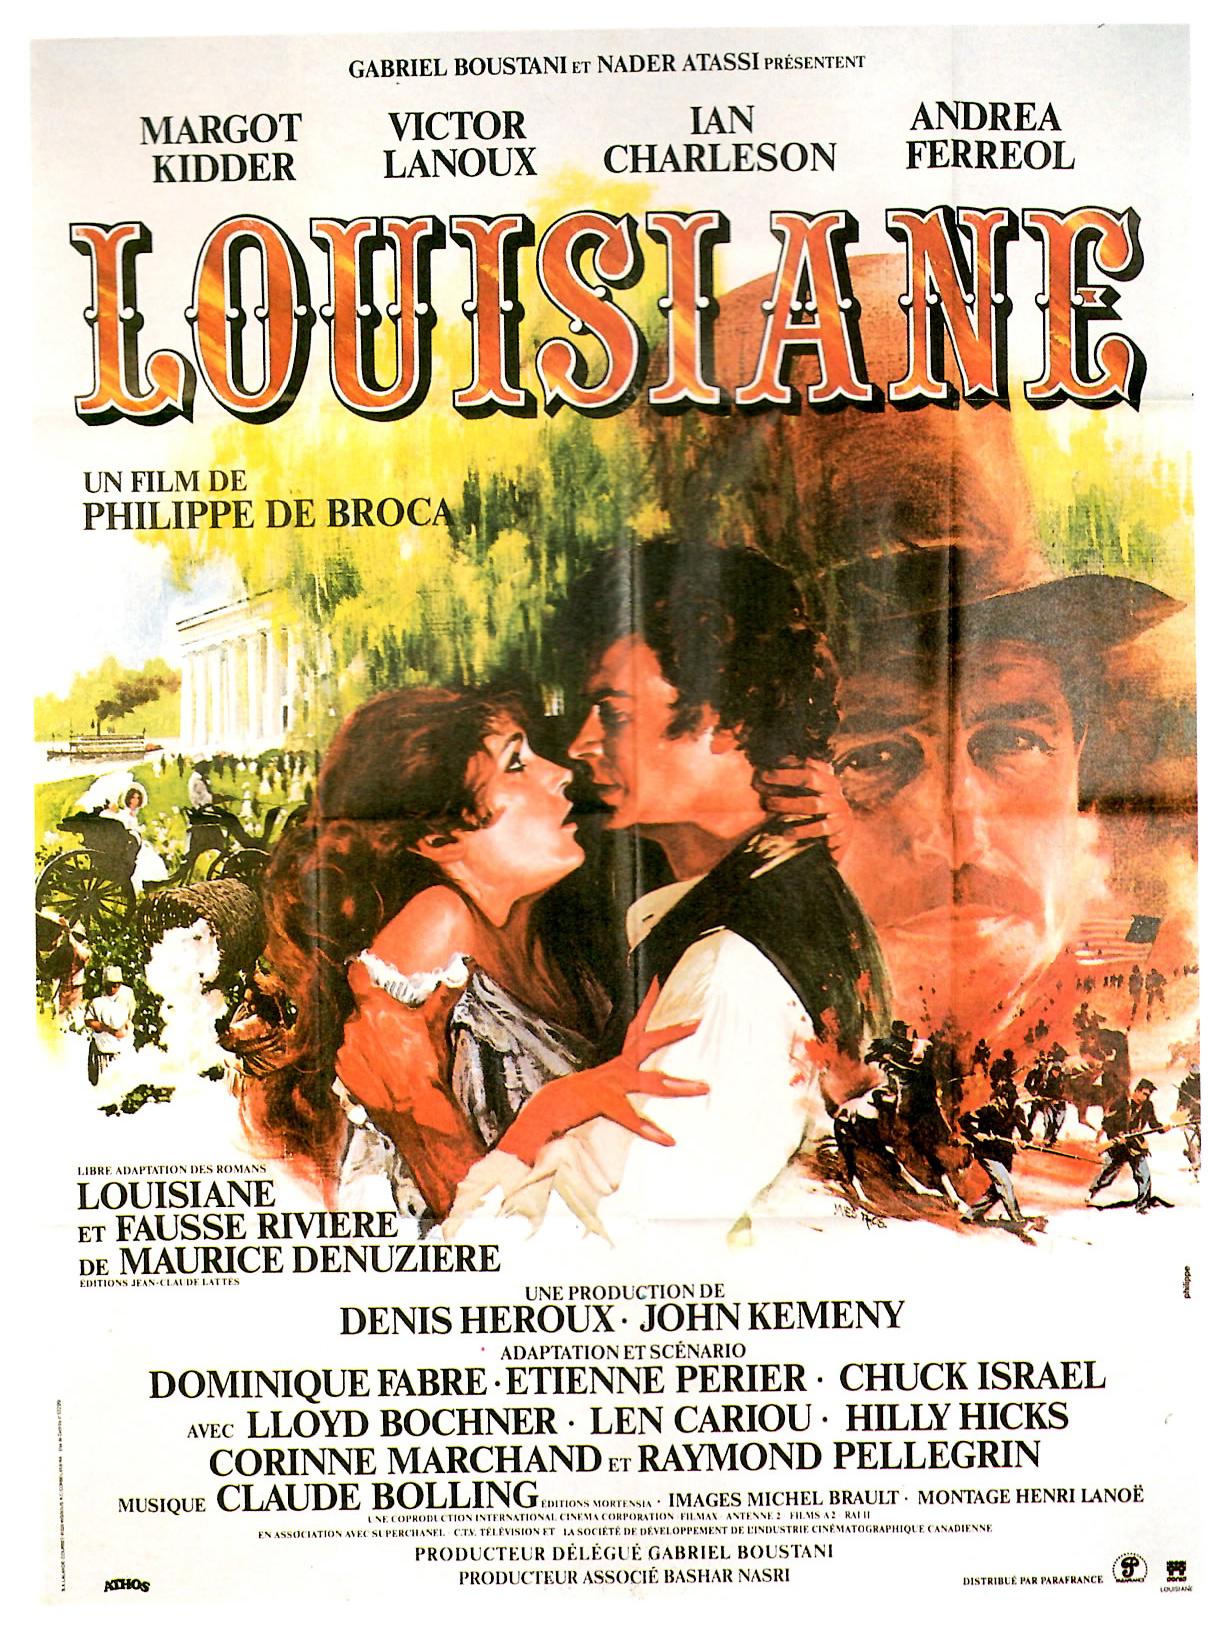 Affiche du film Louisiane de Philippe de Broca